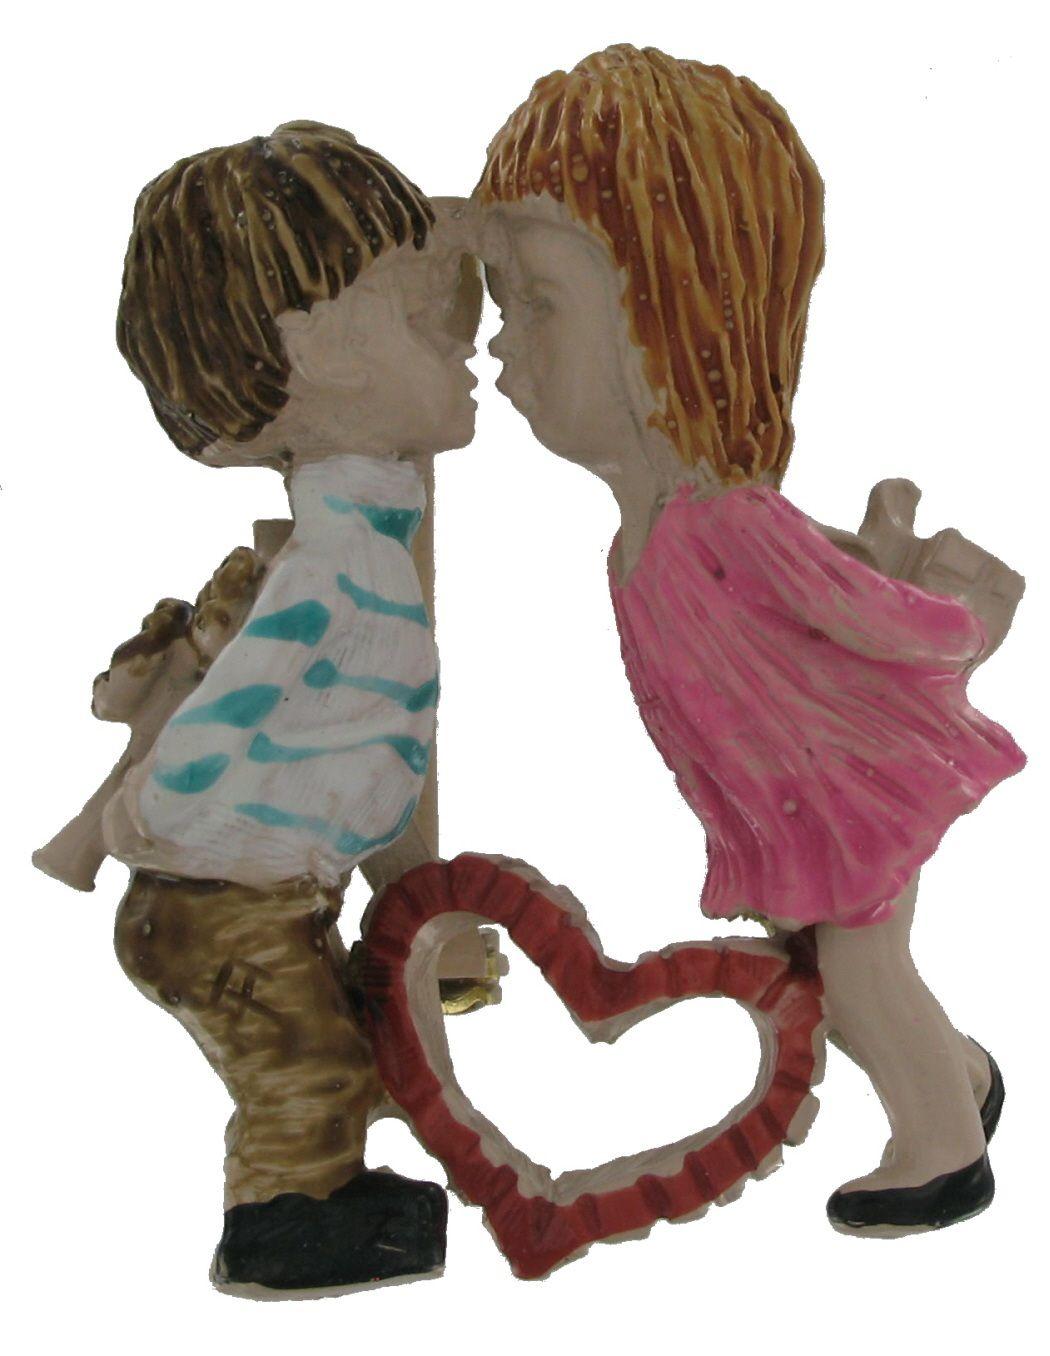 Vintage Fran Mar Moppets Red Heart Kissing Boy Girl Pin